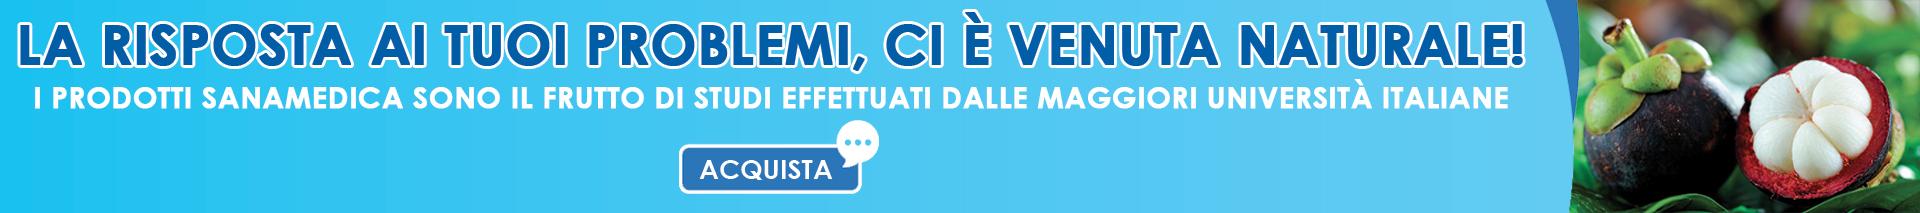 banner-Sanamedica-